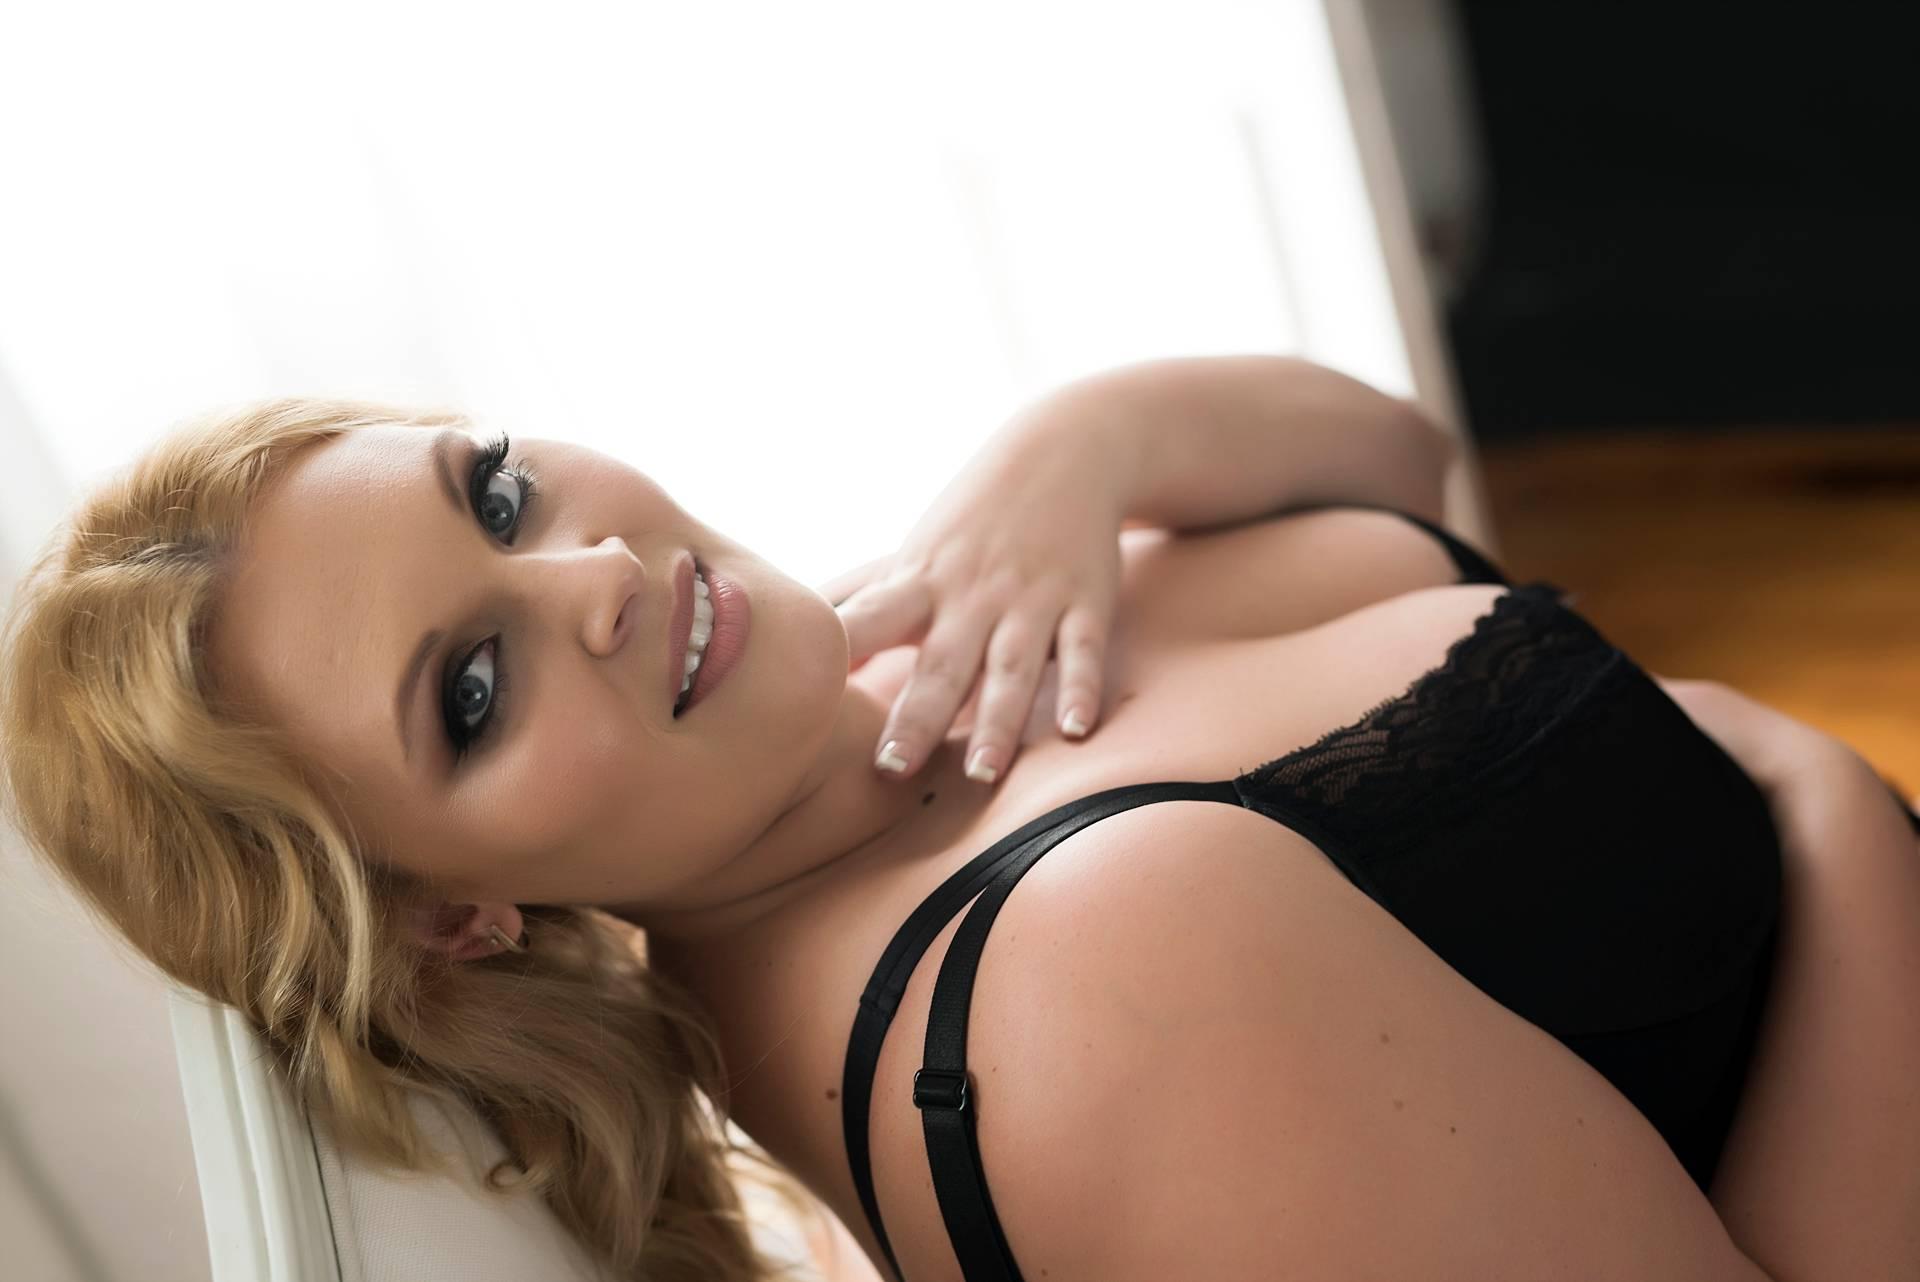 Sexy curvy boudoir